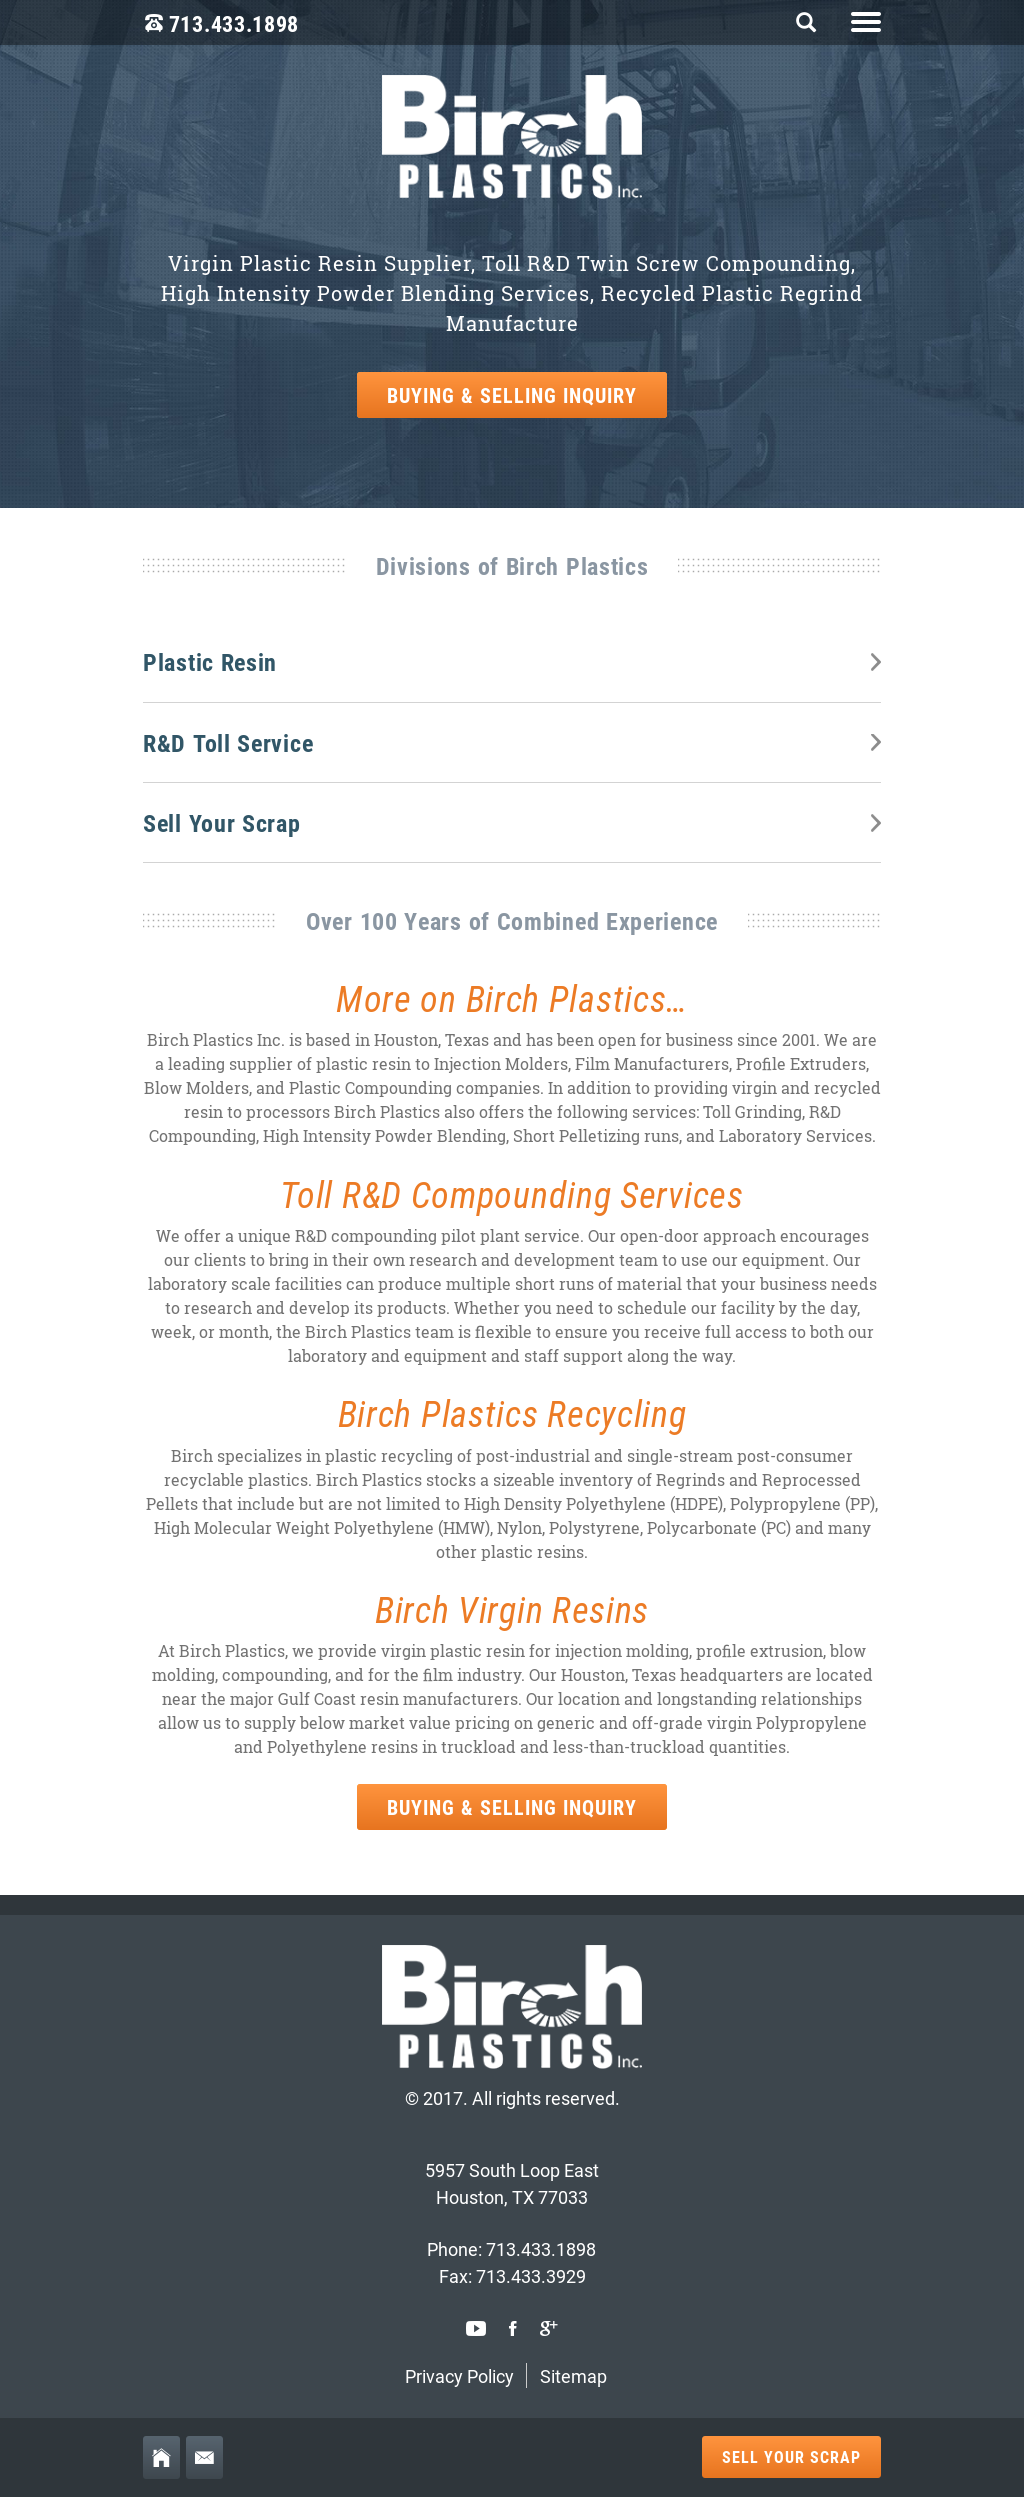 Birch Plastics Competitors, Revenue and Employees - Owler